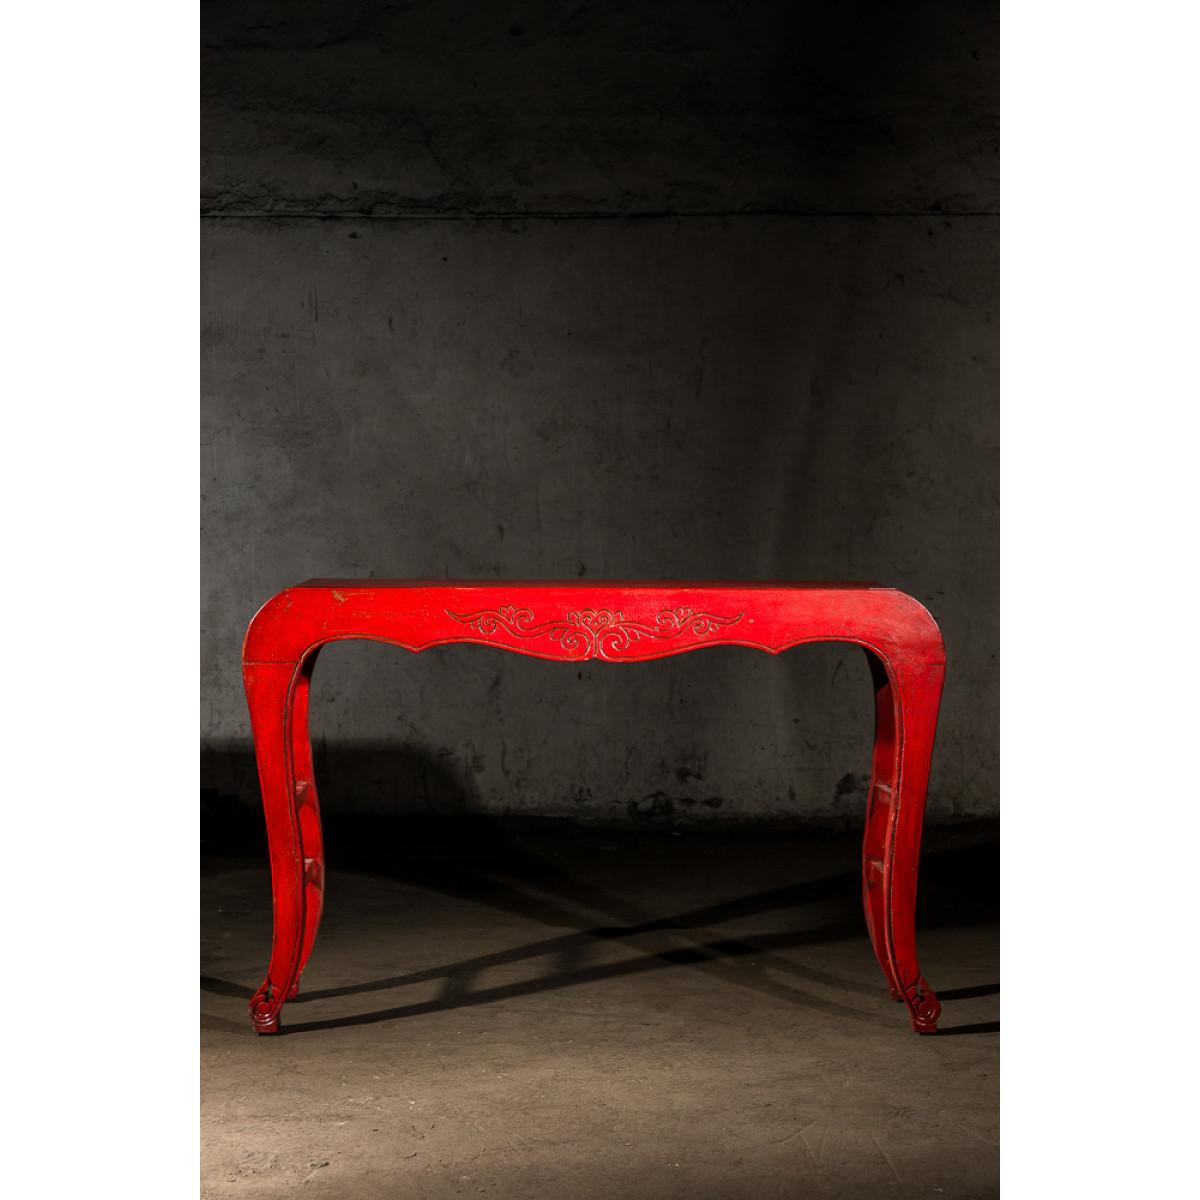 BF-20087 Сян-Ань – стол для курильниц. Ранний период Lинастии Мин.